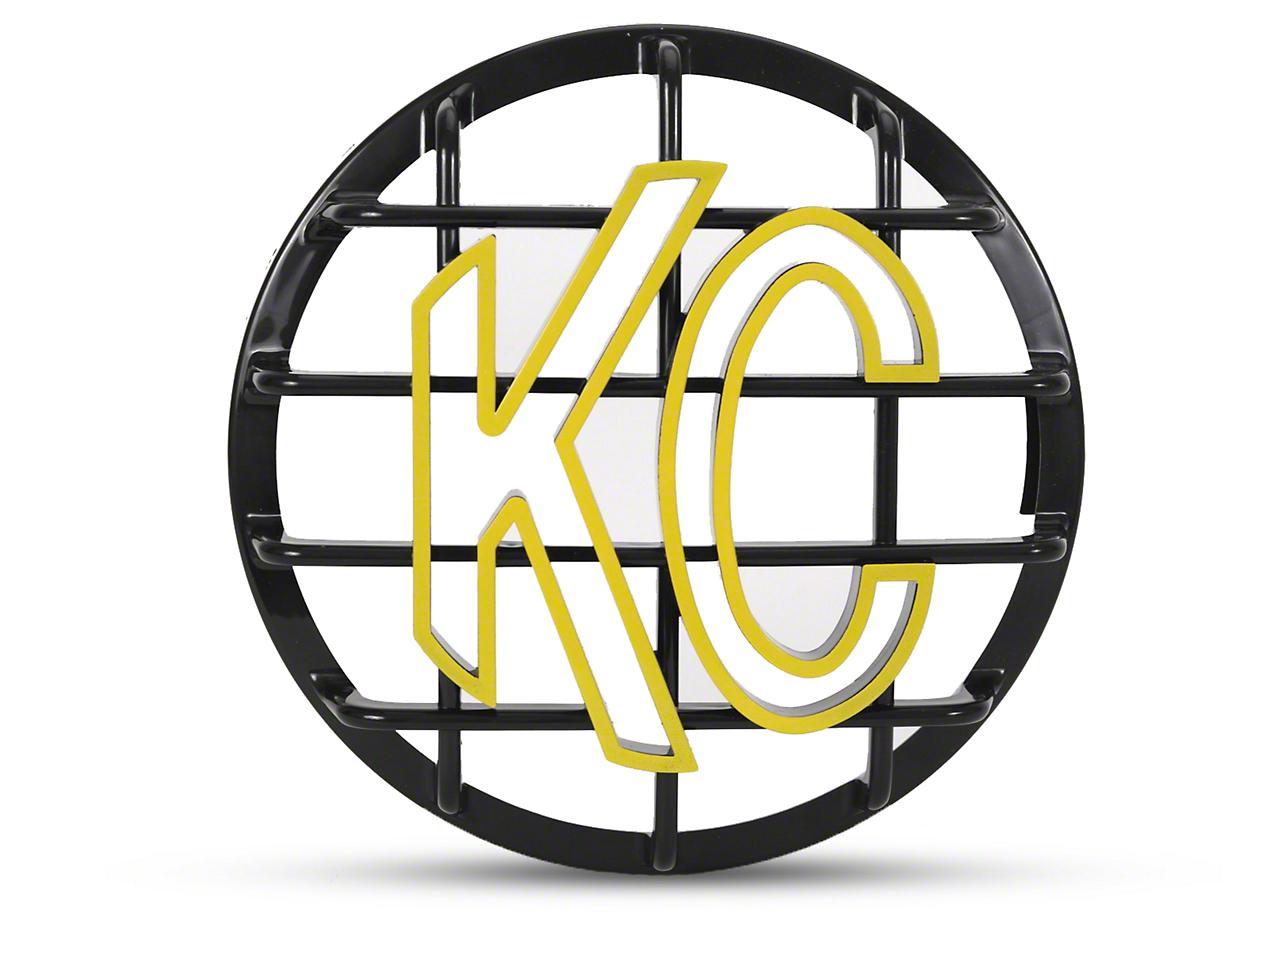 KC HiLiTES 6 in. Round Stone Guard for Daylighter & Slimlite - Black w/ Yellow KC Logo (07-18 Silverado 1500)